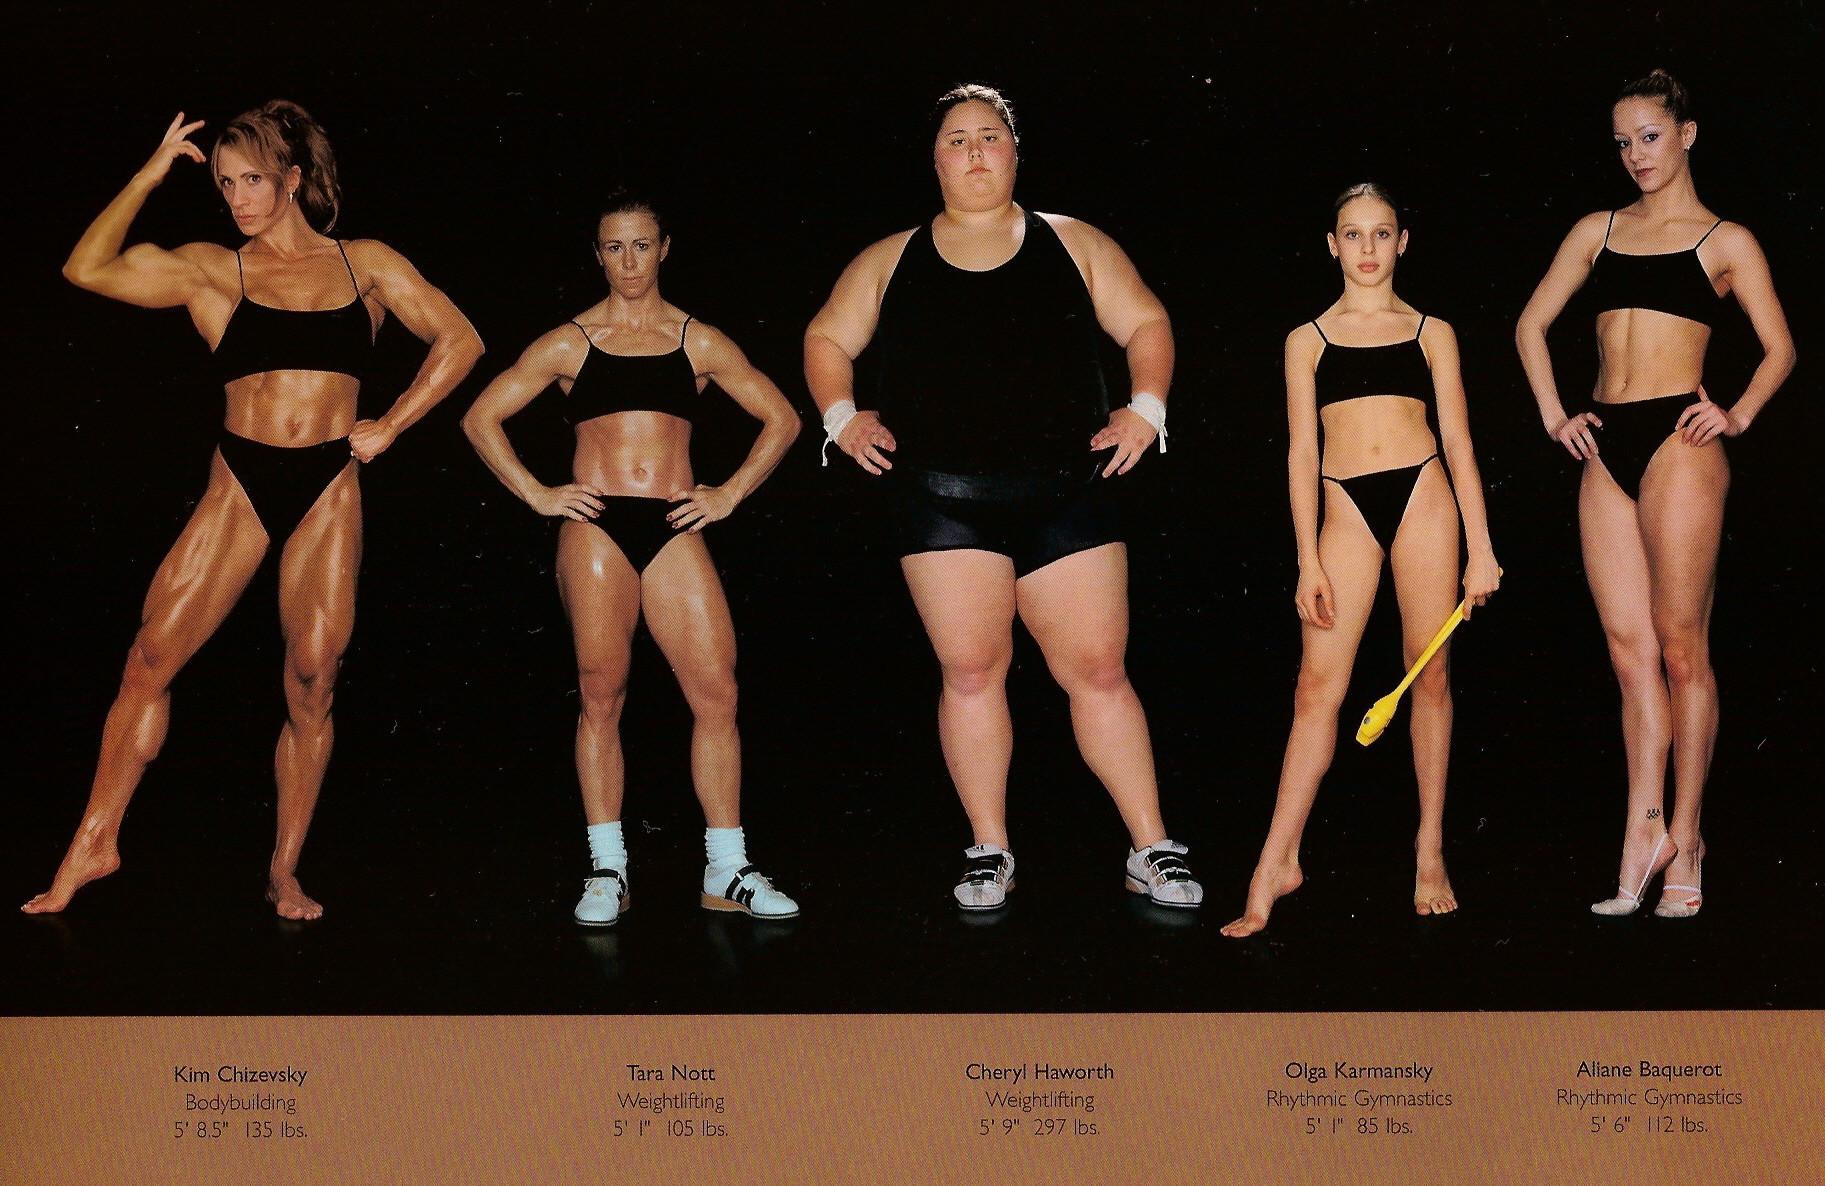 Howard Schatz / слева направо: бодибилдинг, вейтлифтинг, тоже вейтлифтинг, ритмическая гимнастика, тоже ритмическая гимнастика.